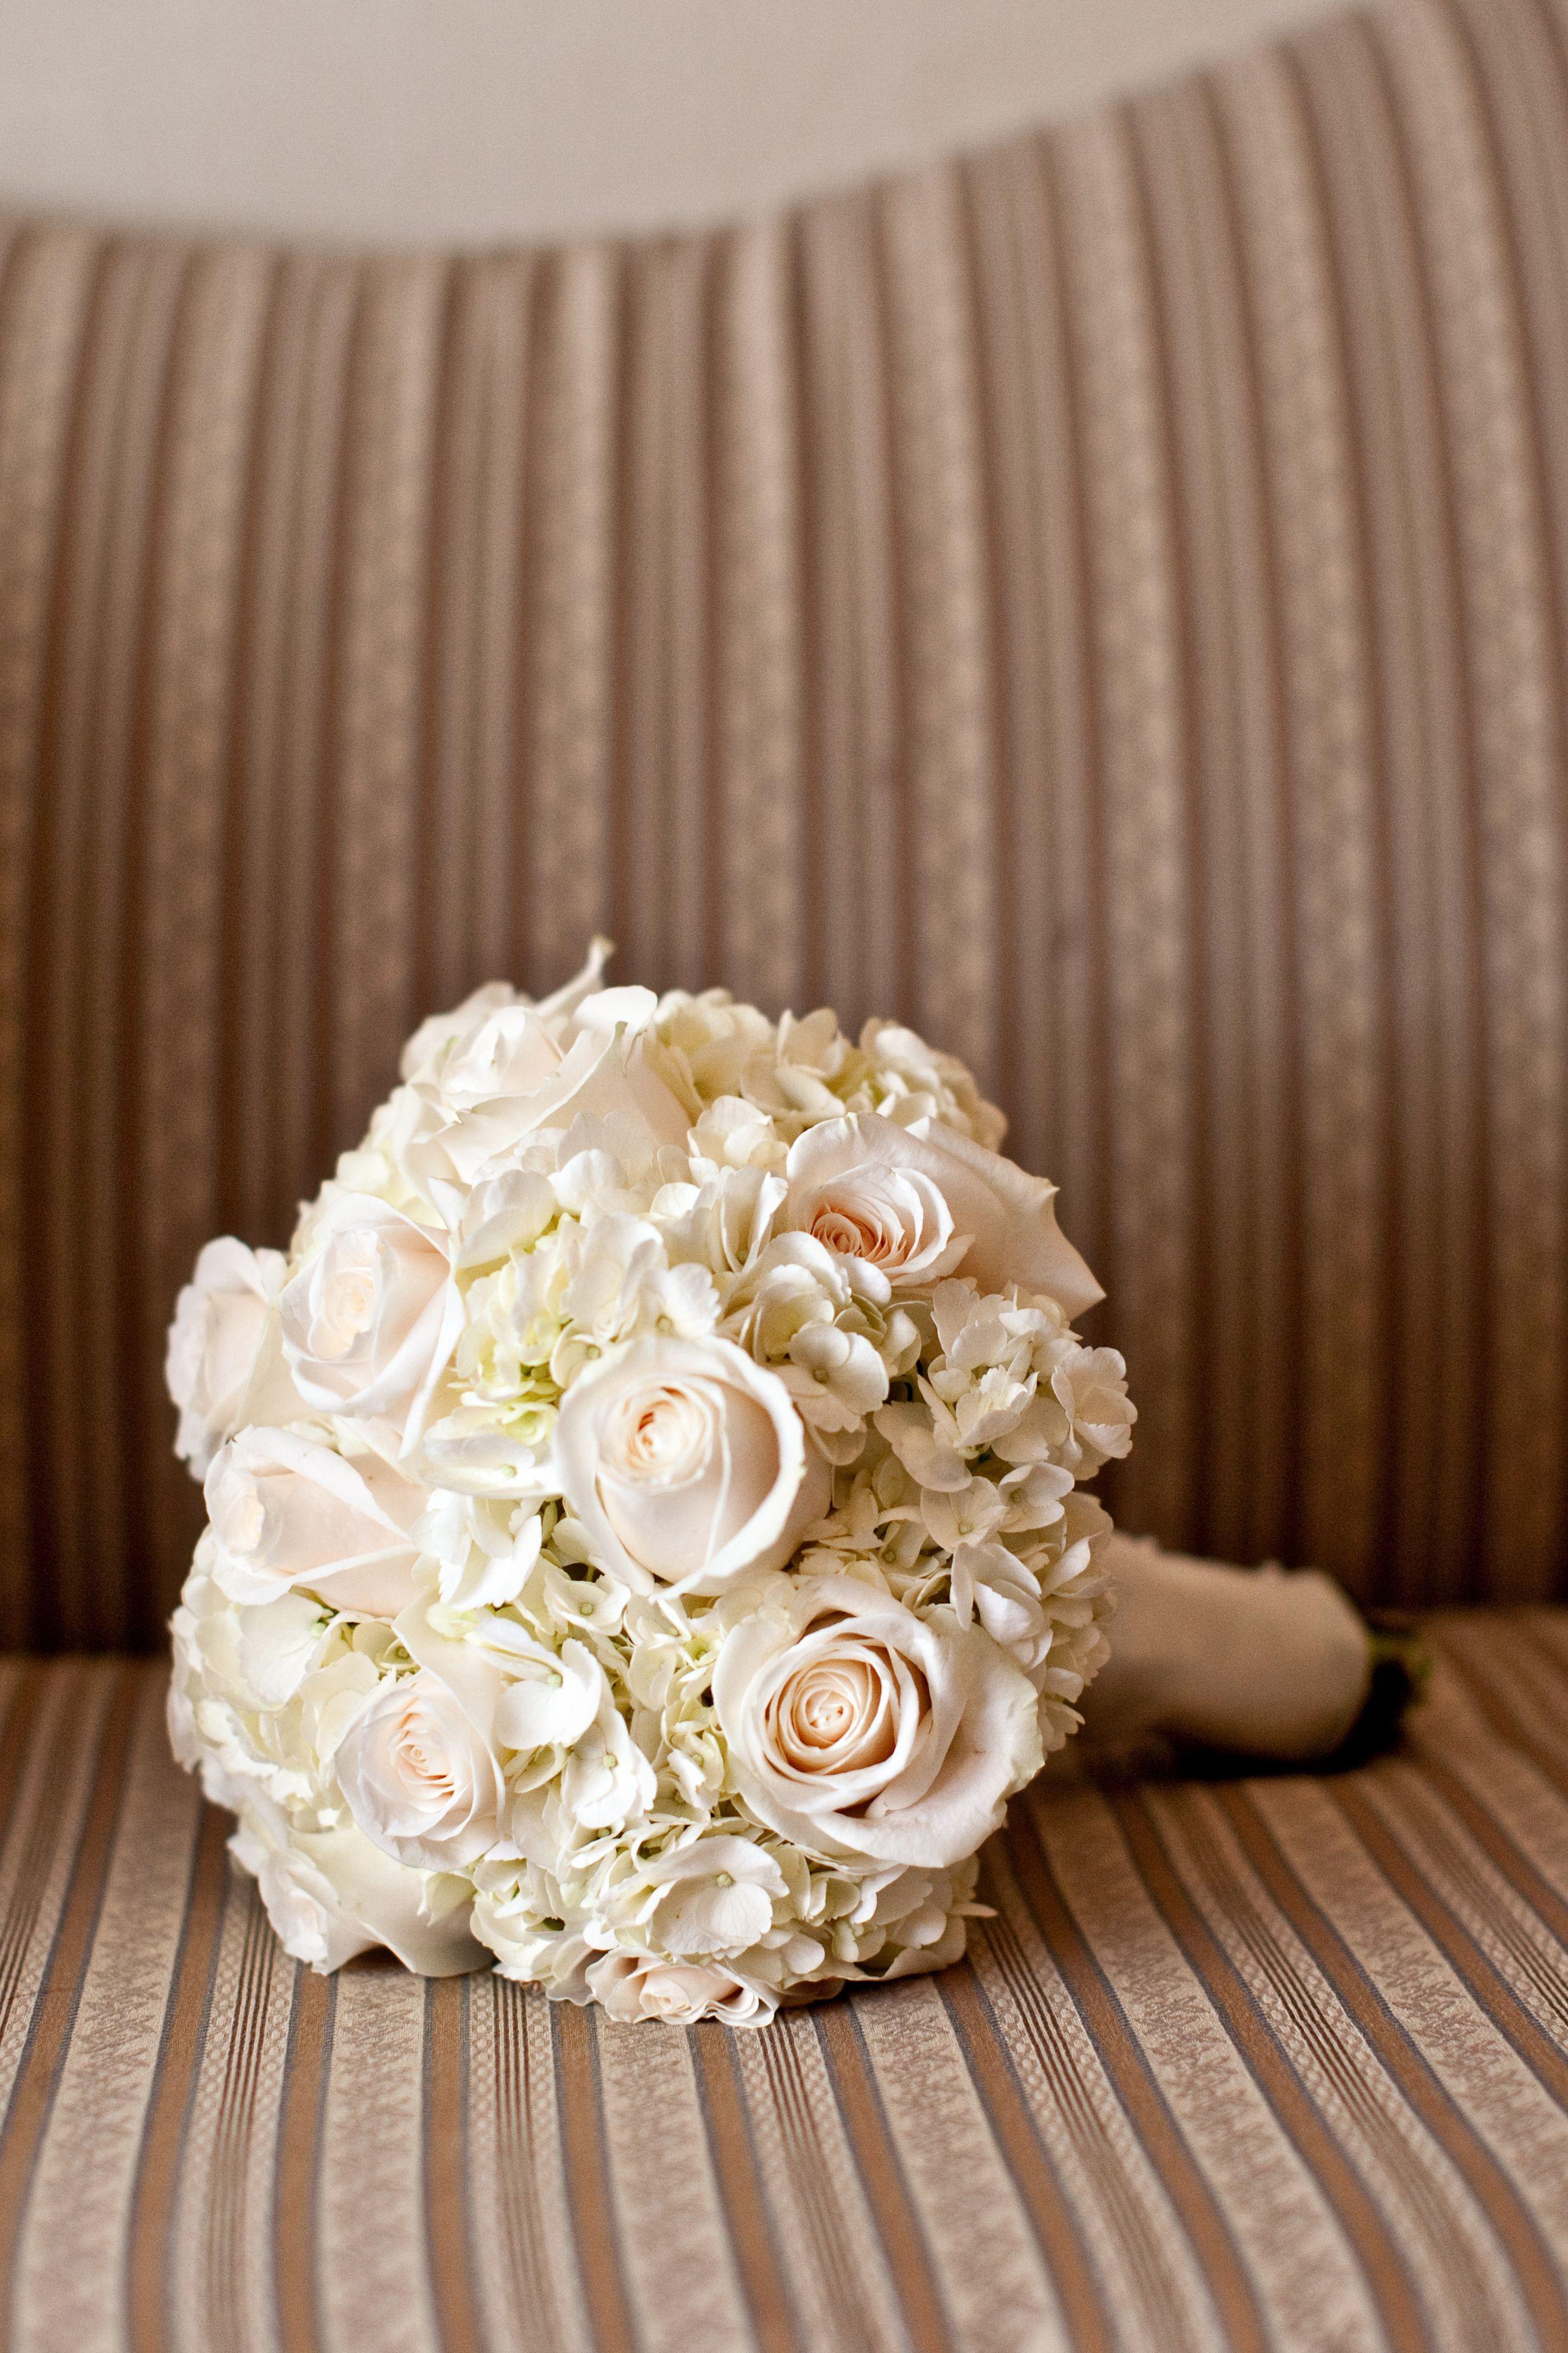 My Bouquet Cream Colored Roses And White Hydrangea Hydrangea